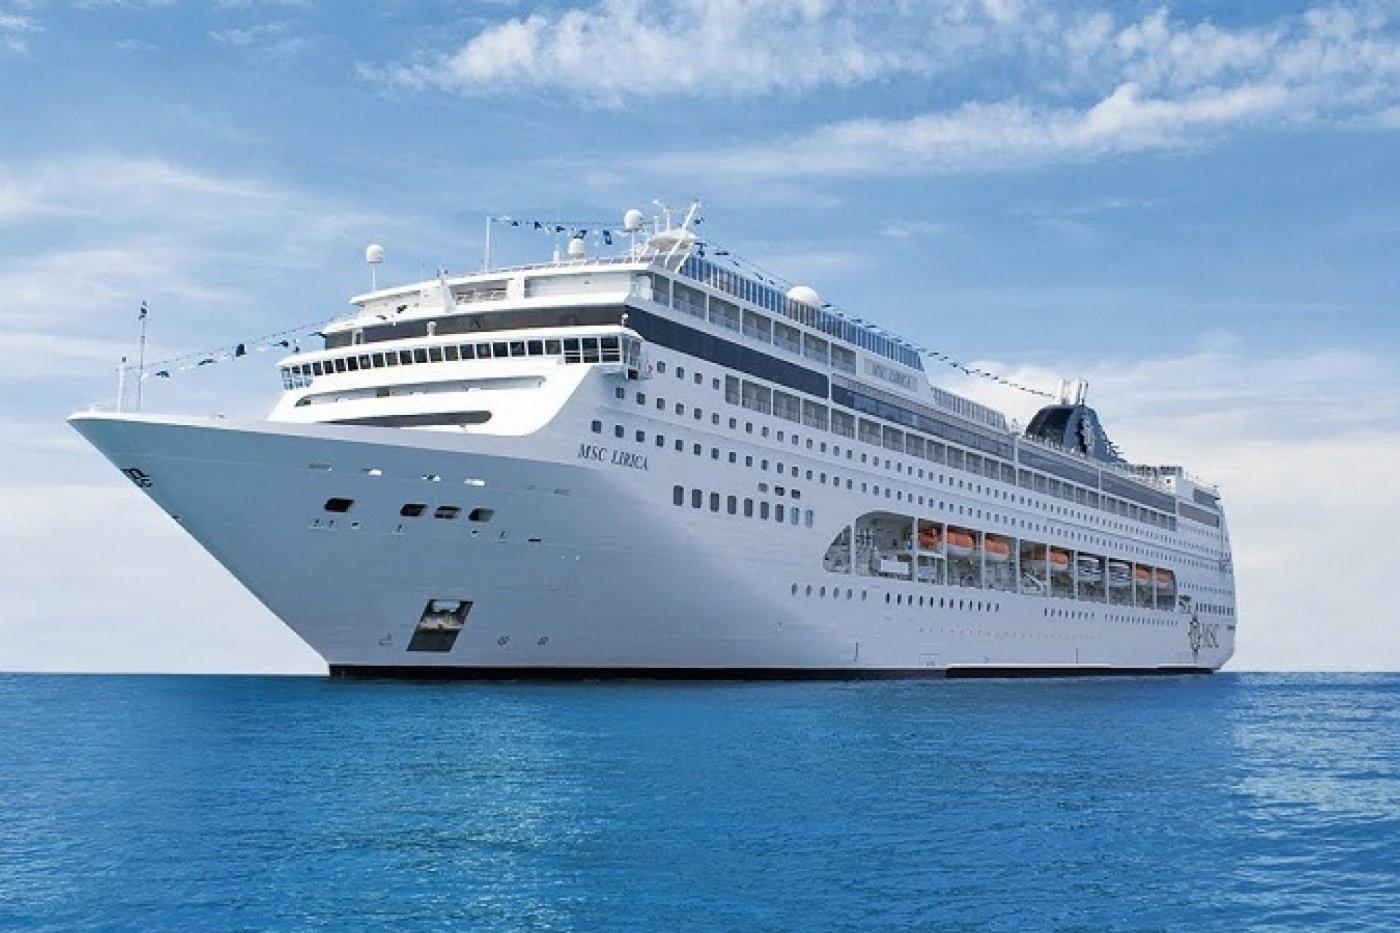 Msc Lirica ile BAE Umman Paket Gemi Turu cruise gemi turları